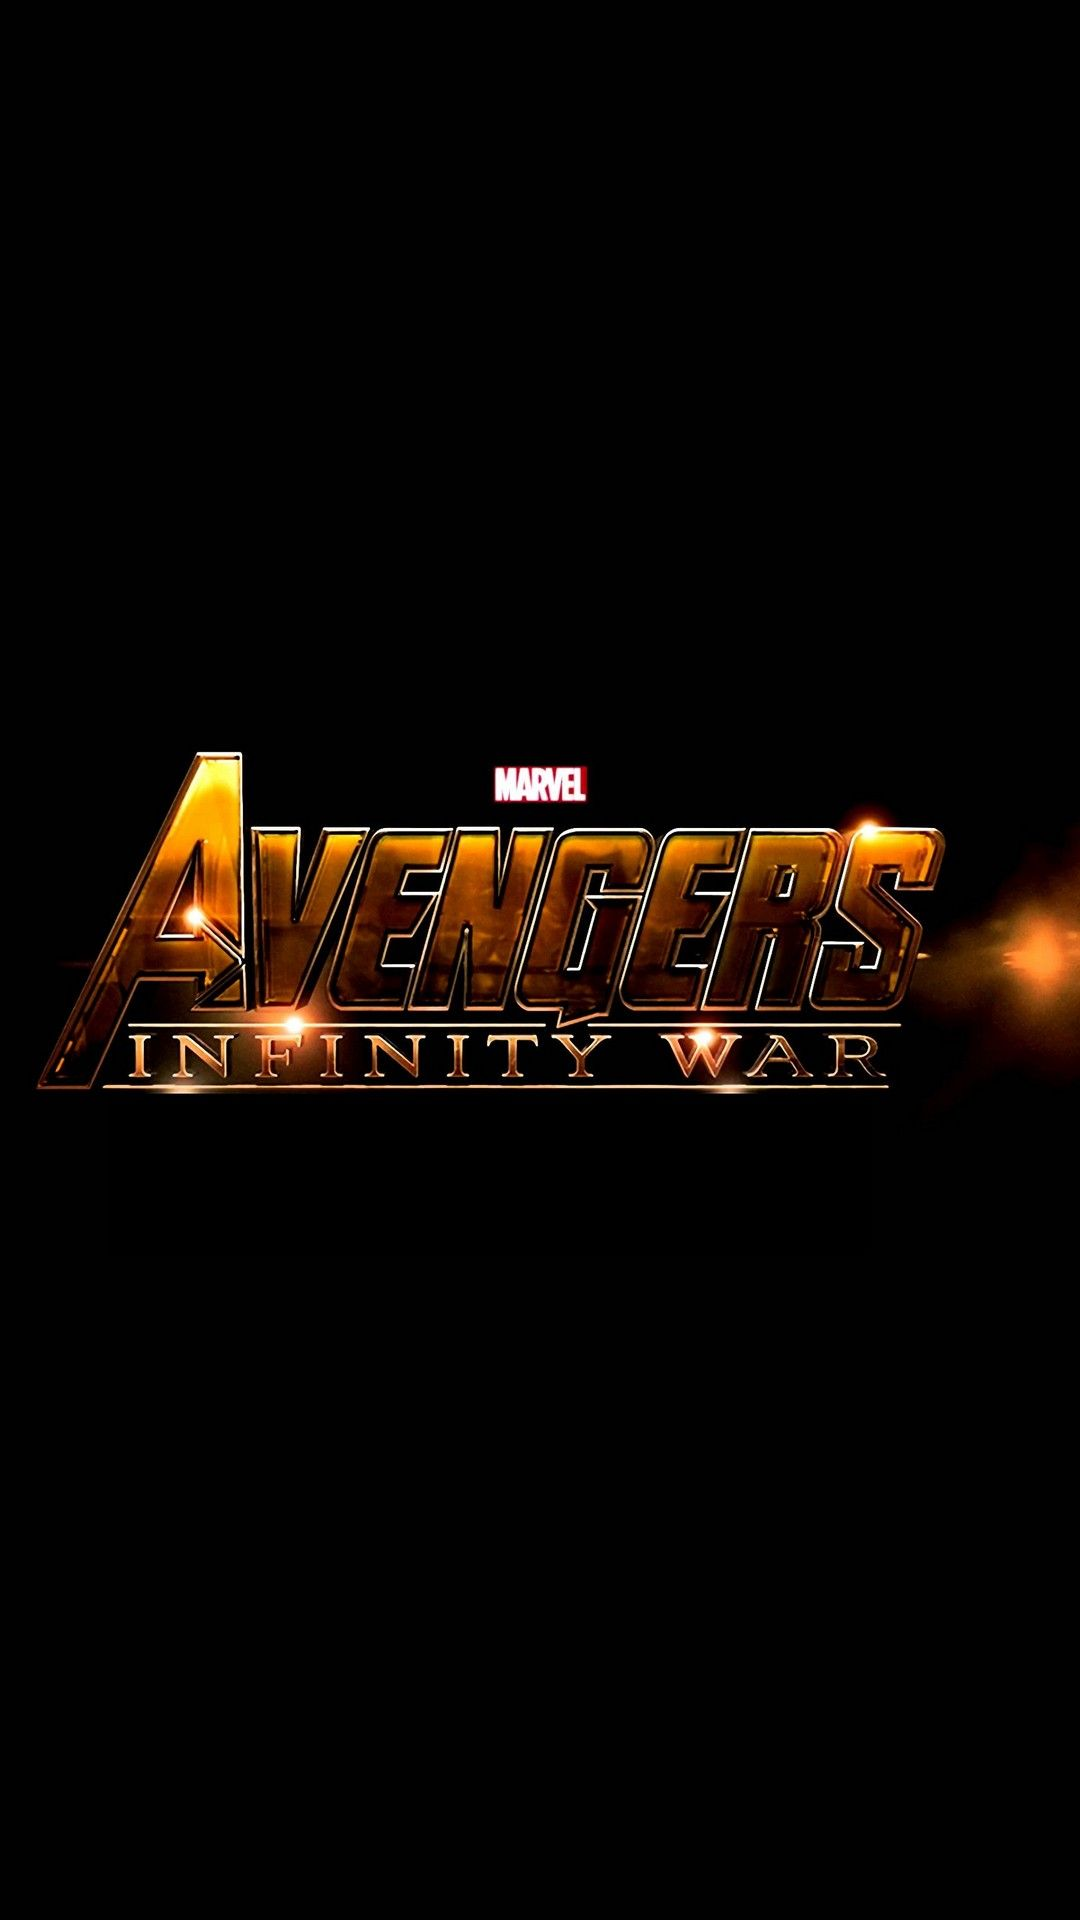 Wallpapers Avengers Infinity War Infinity War Avengers Infinity War Android Wallpaper